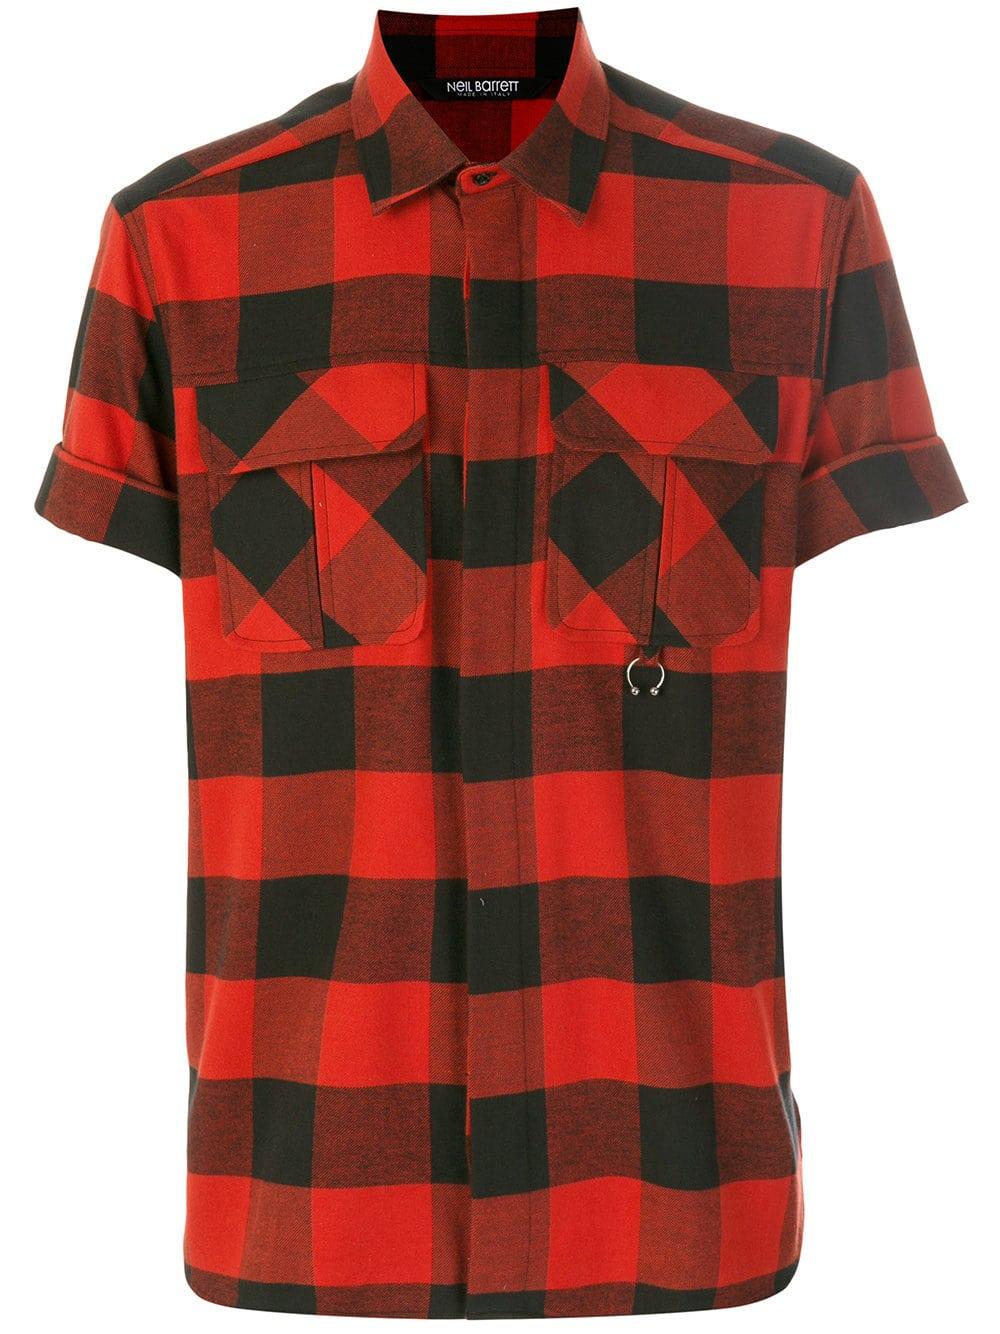 Neil Barrett Buffalo Plaid Short Sleeve Shirt Farfetch Sale